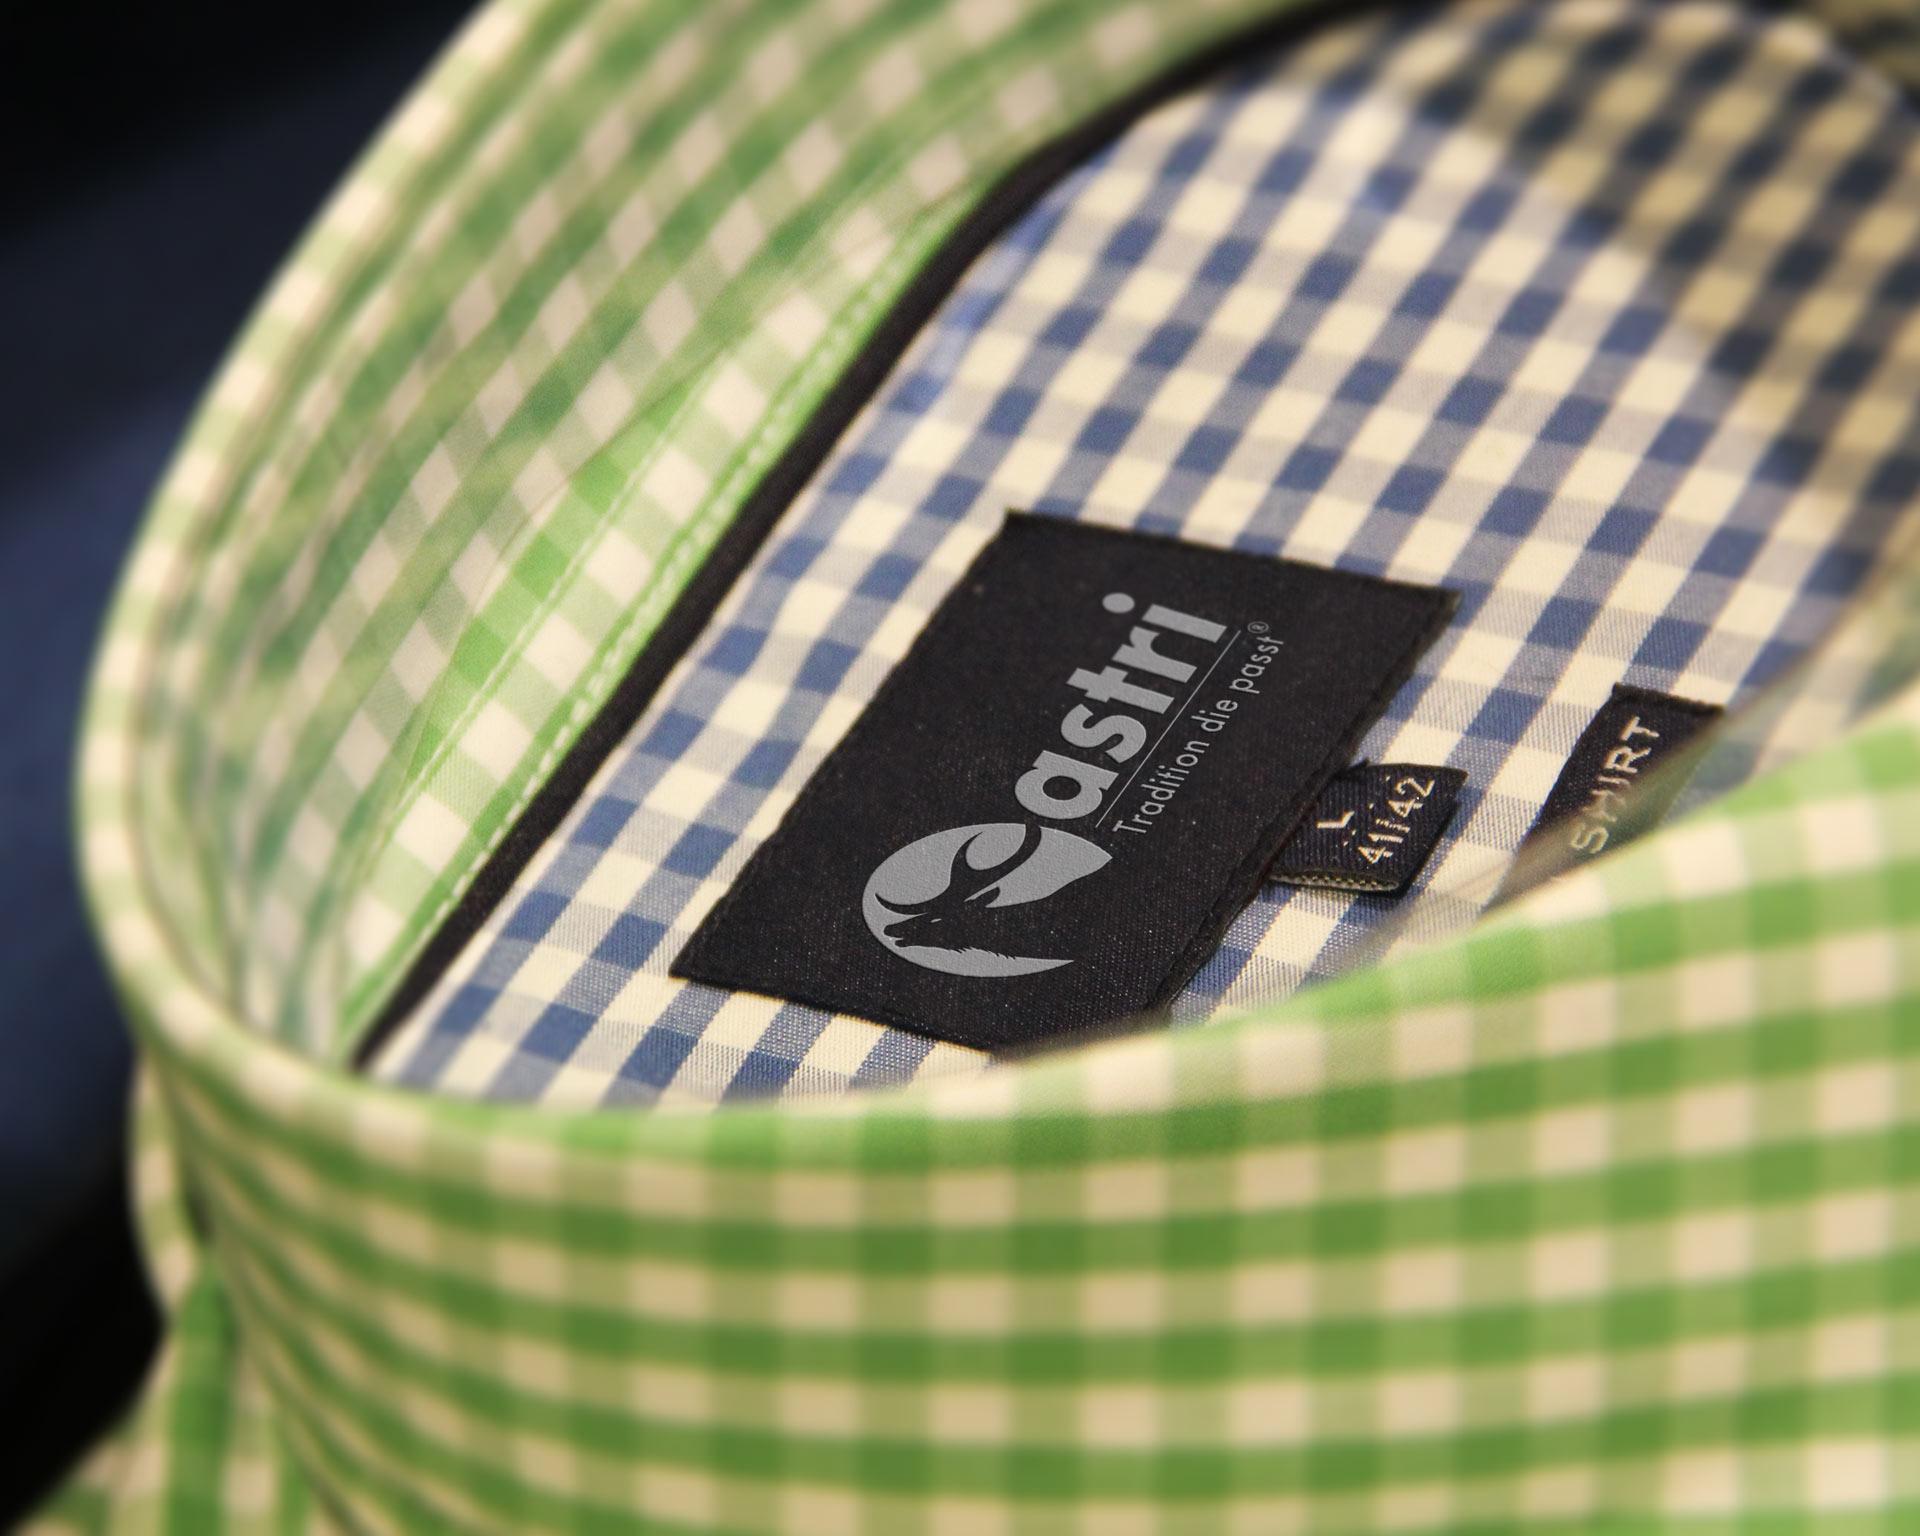 Werbeagentur - agentur 13 Tirol, astri Branding